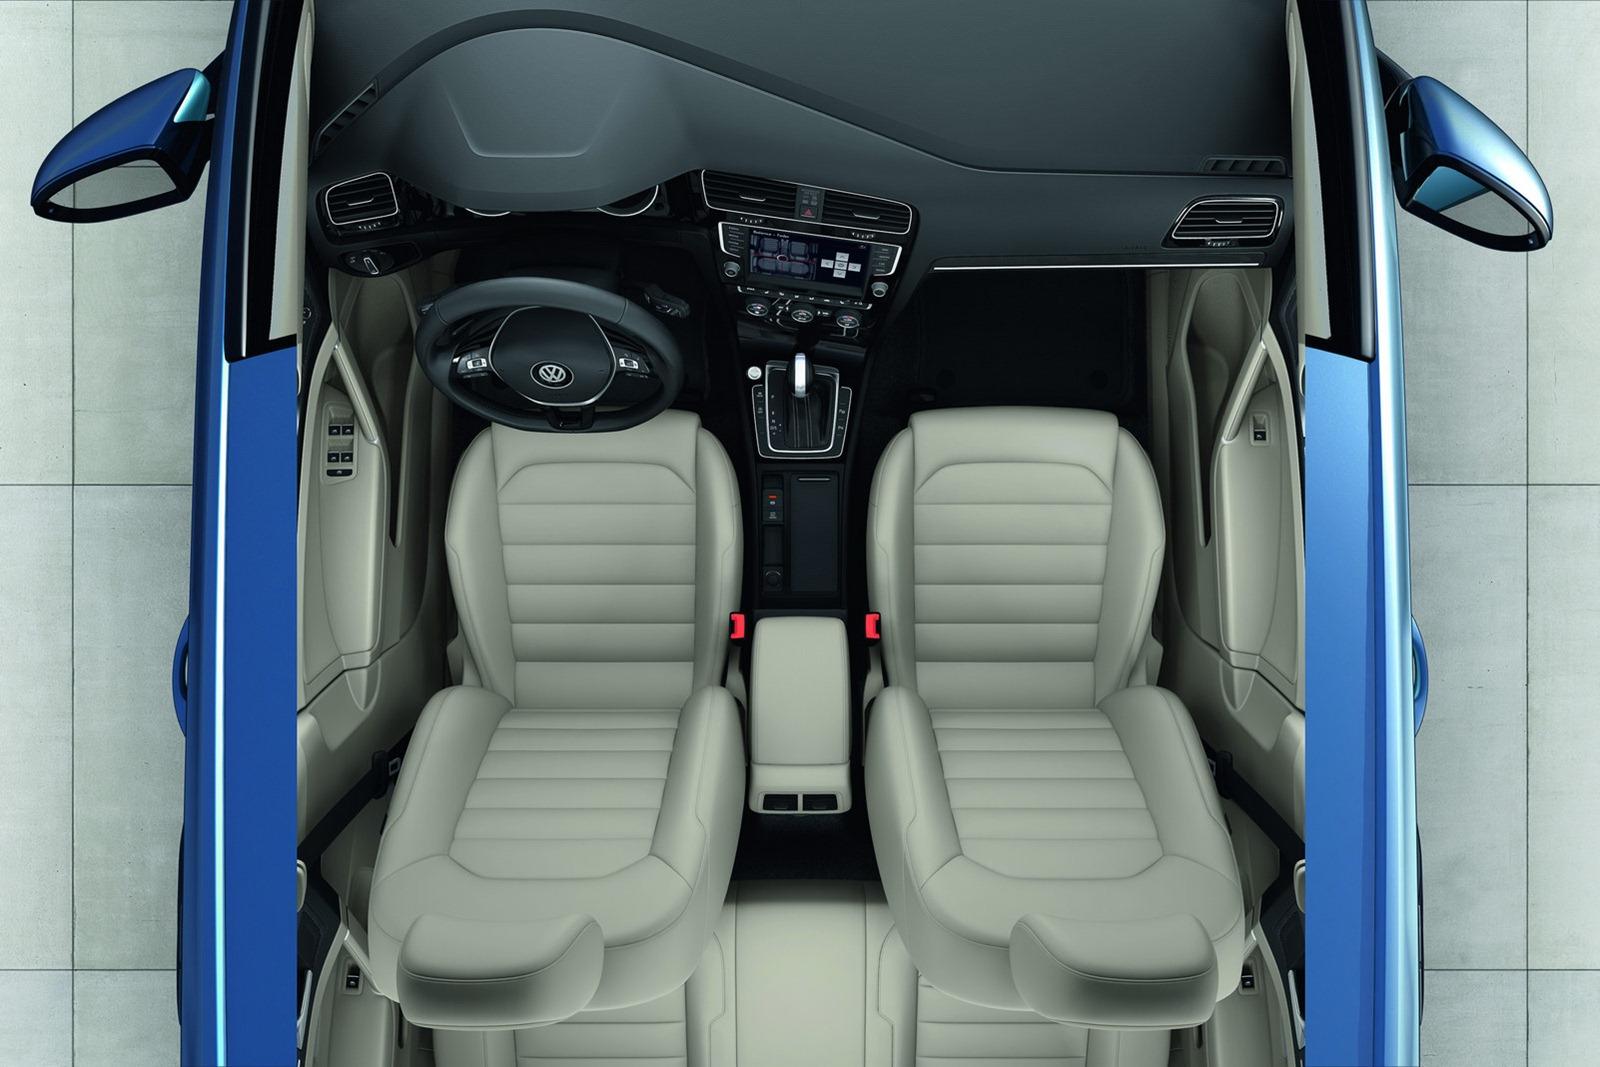 2013 vw mk7 golf interior 8 for Golf 8 interieur